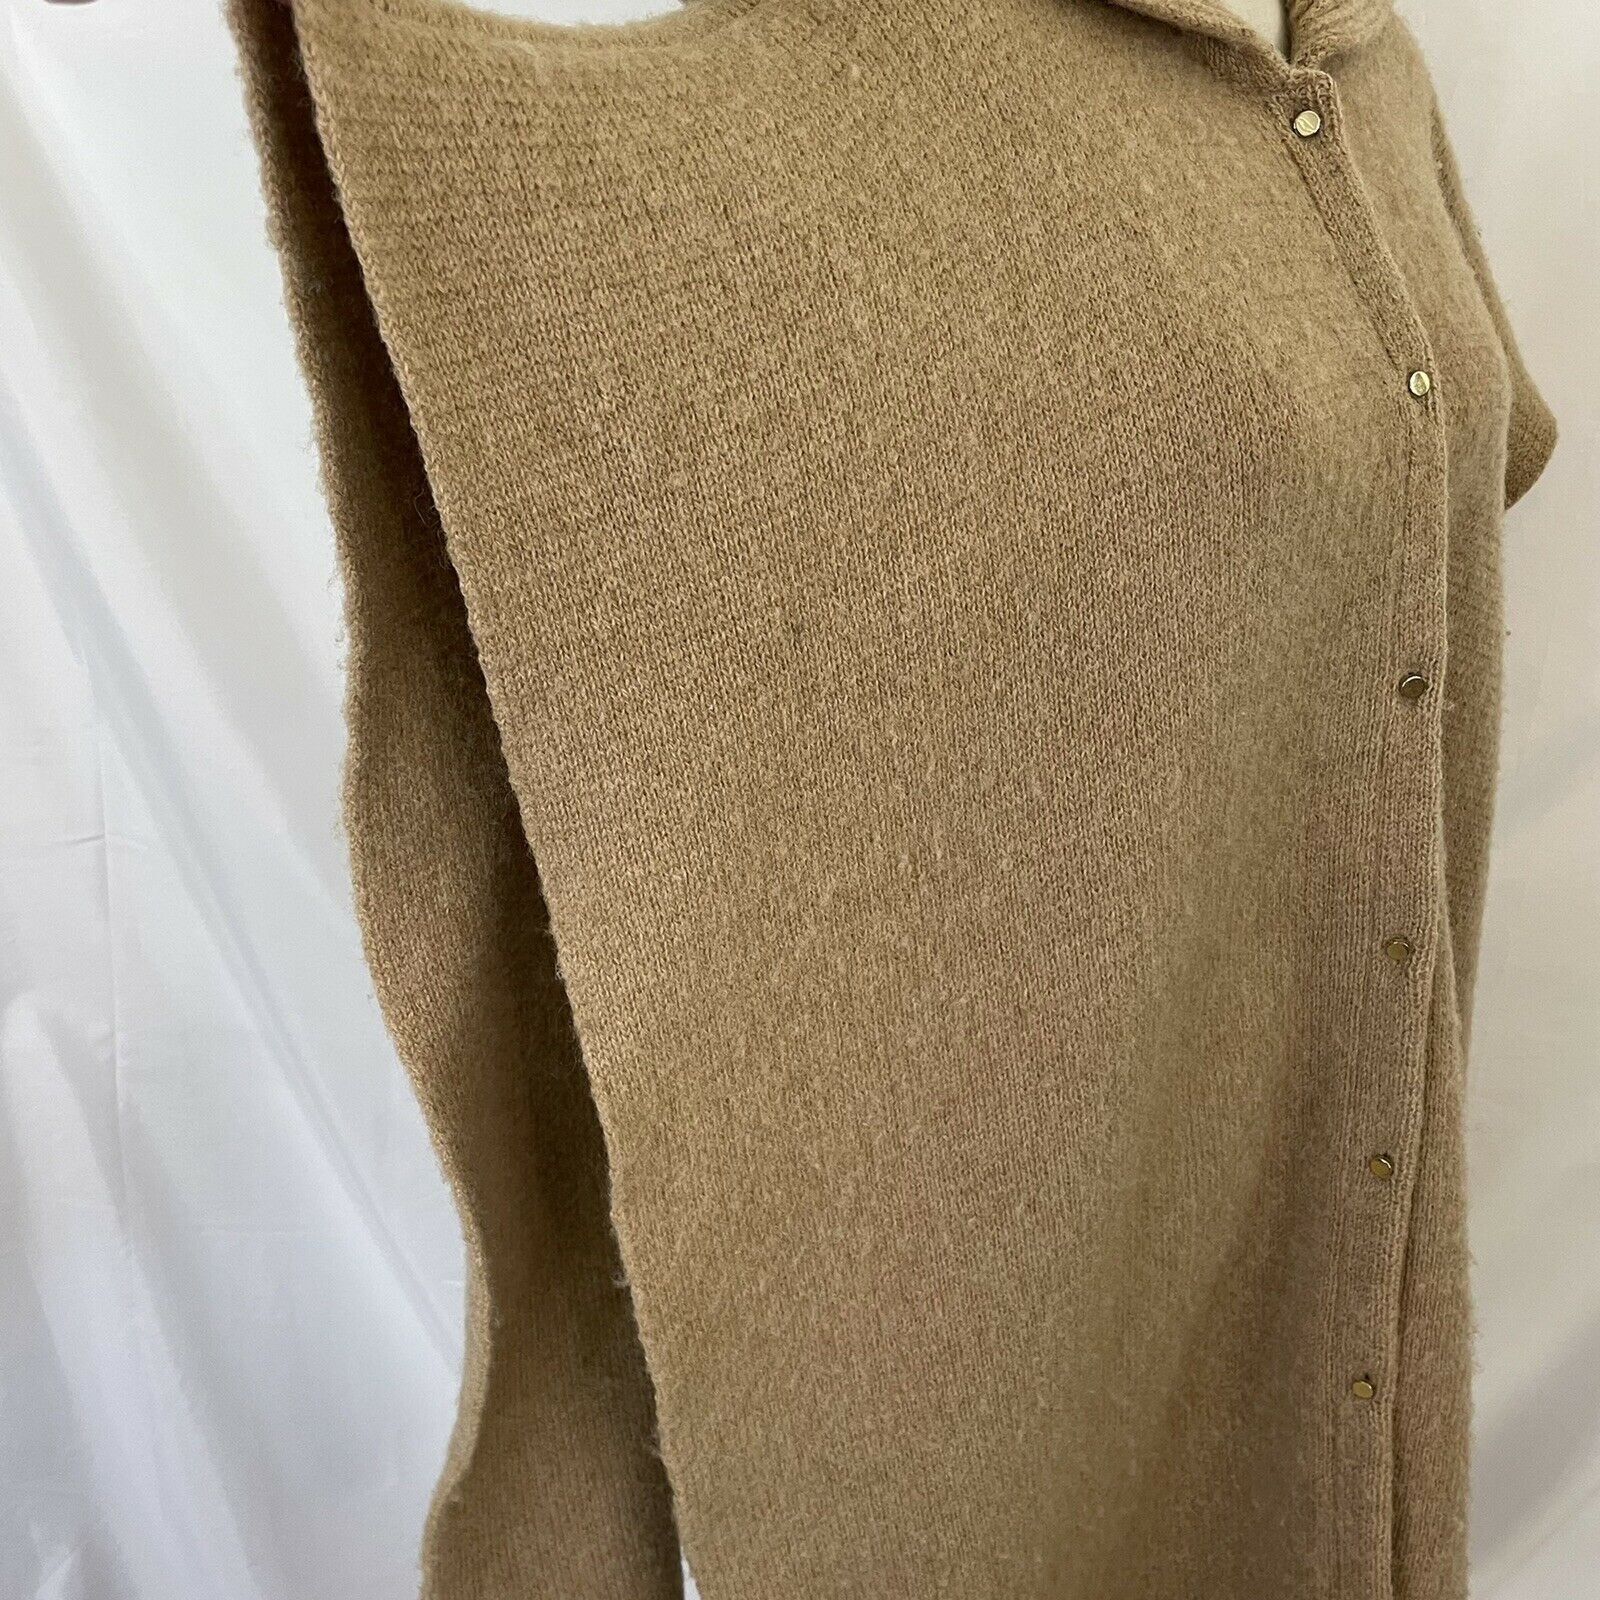 Bonnie Cashin Camel Knit Sweater Cape Poncho Coat - image 6